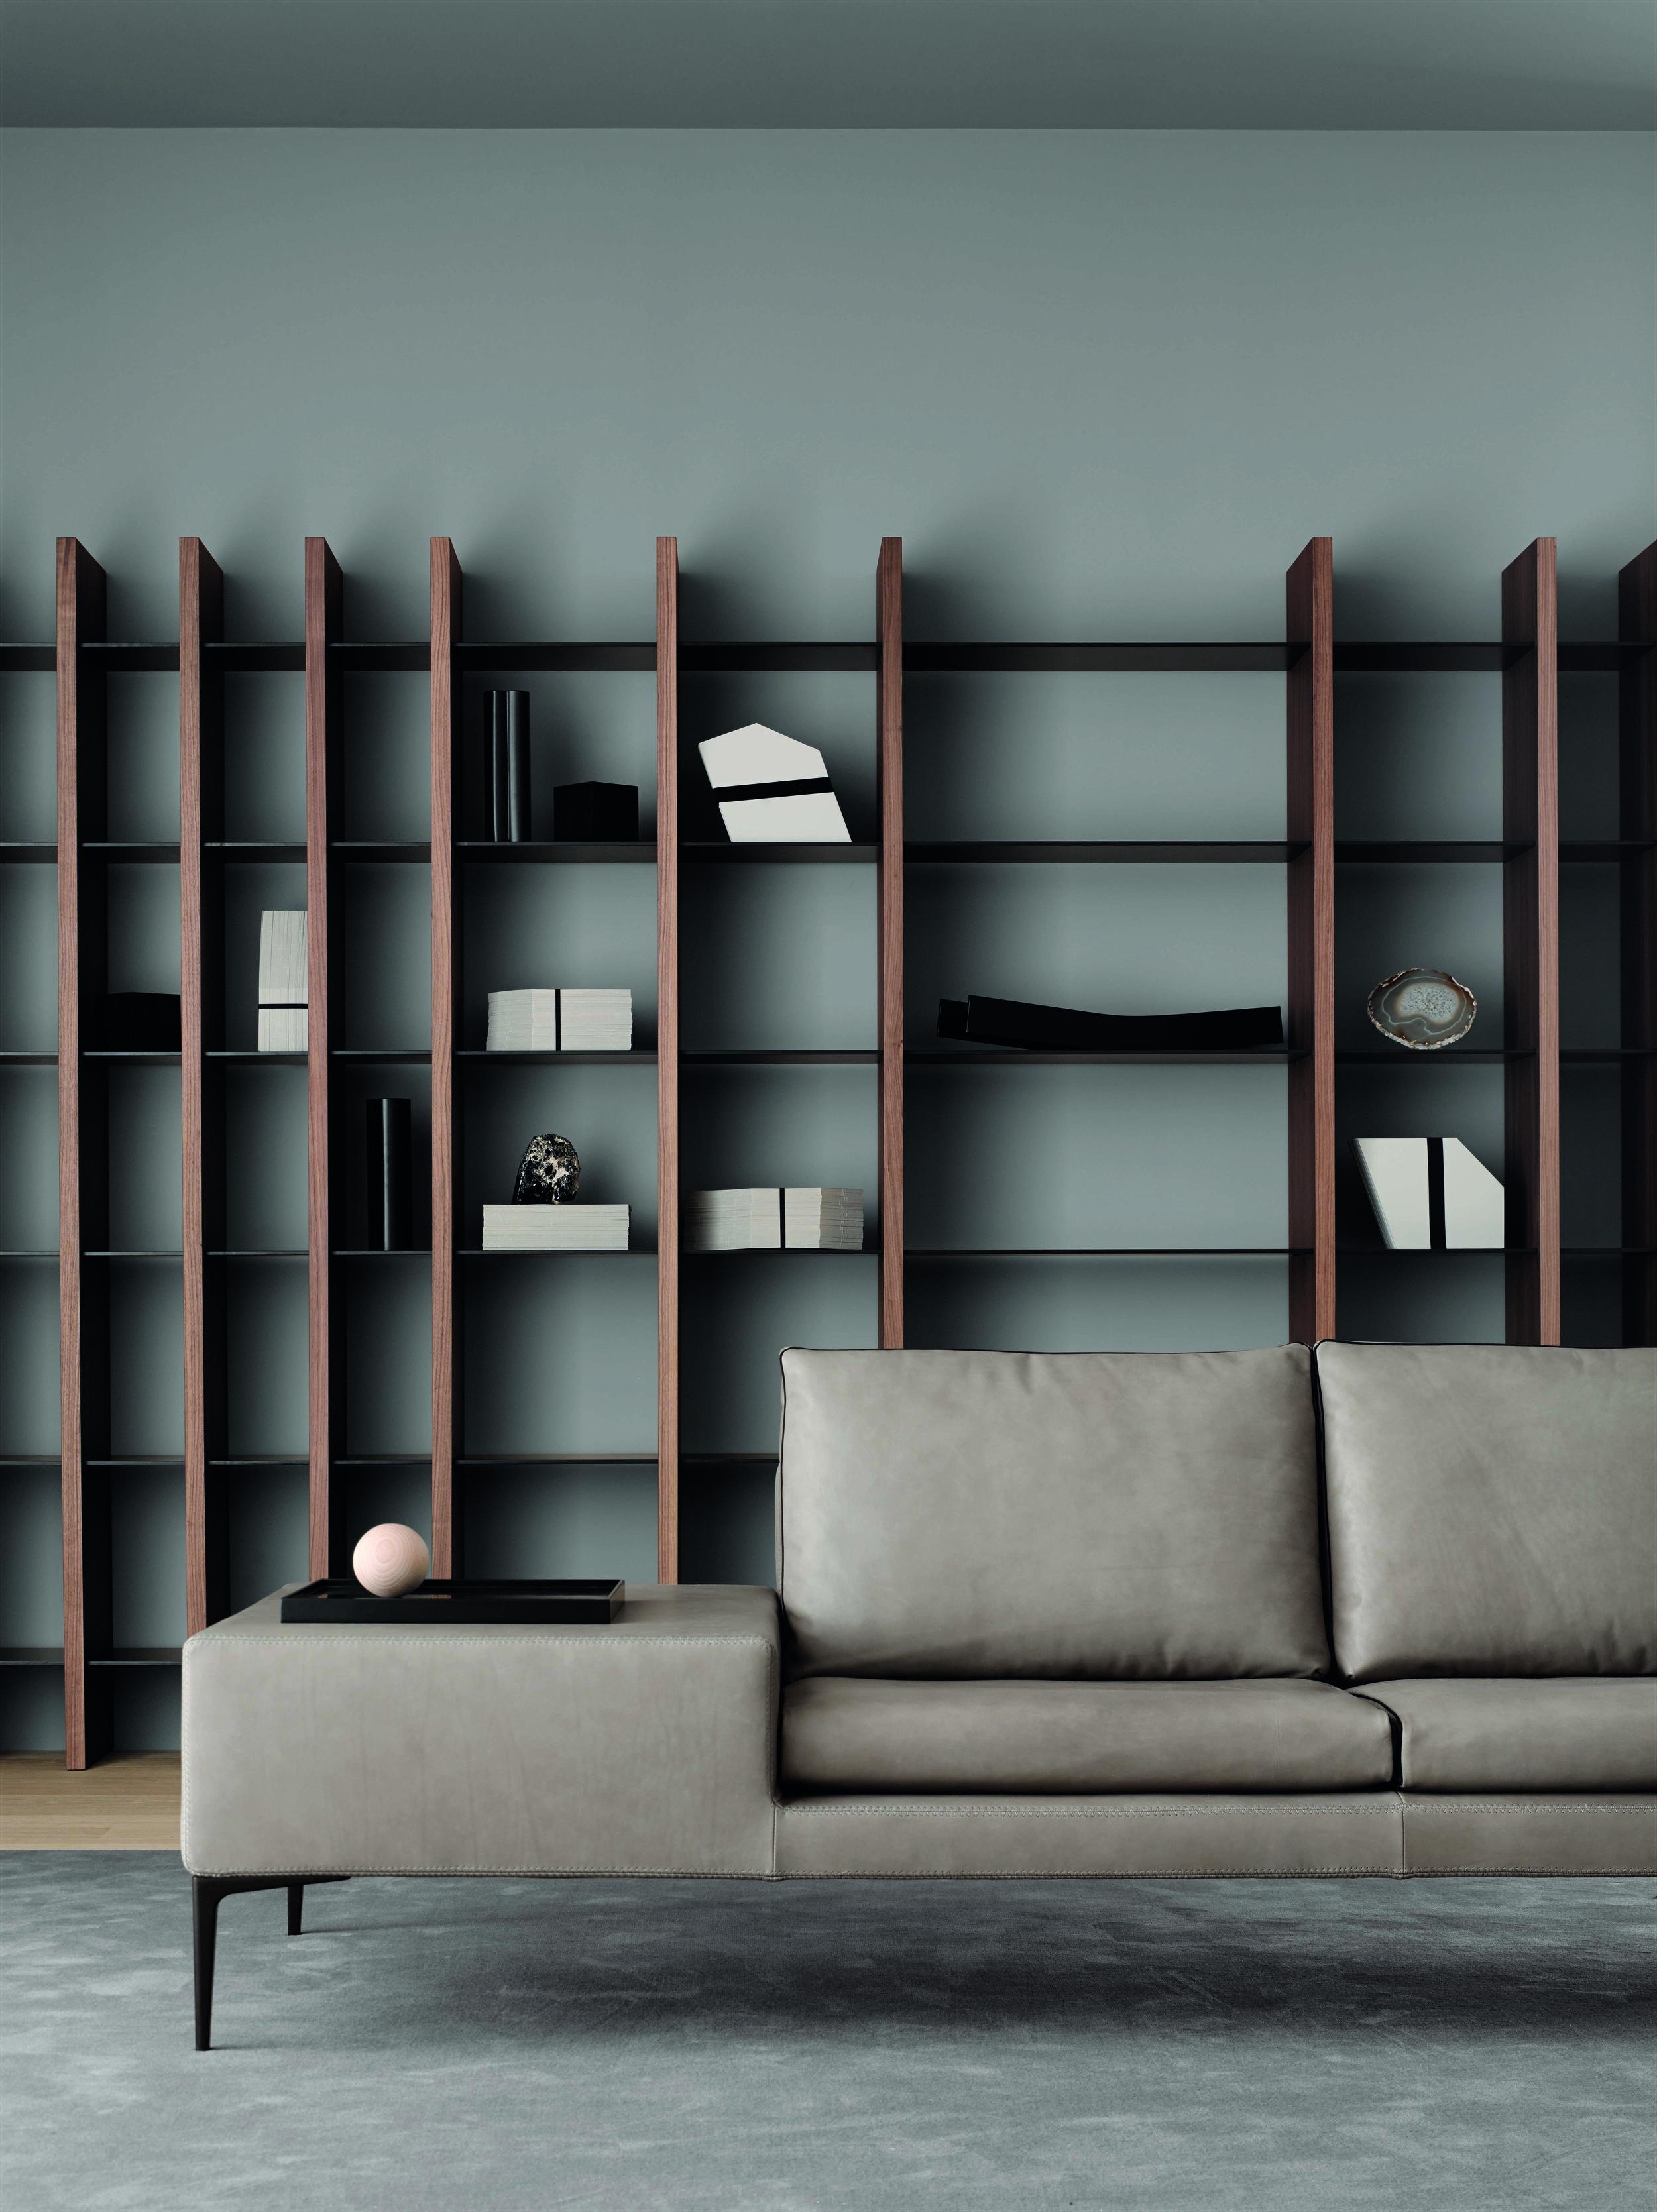 02_Parere_Bookcase + Elsa_Sofa.jpg